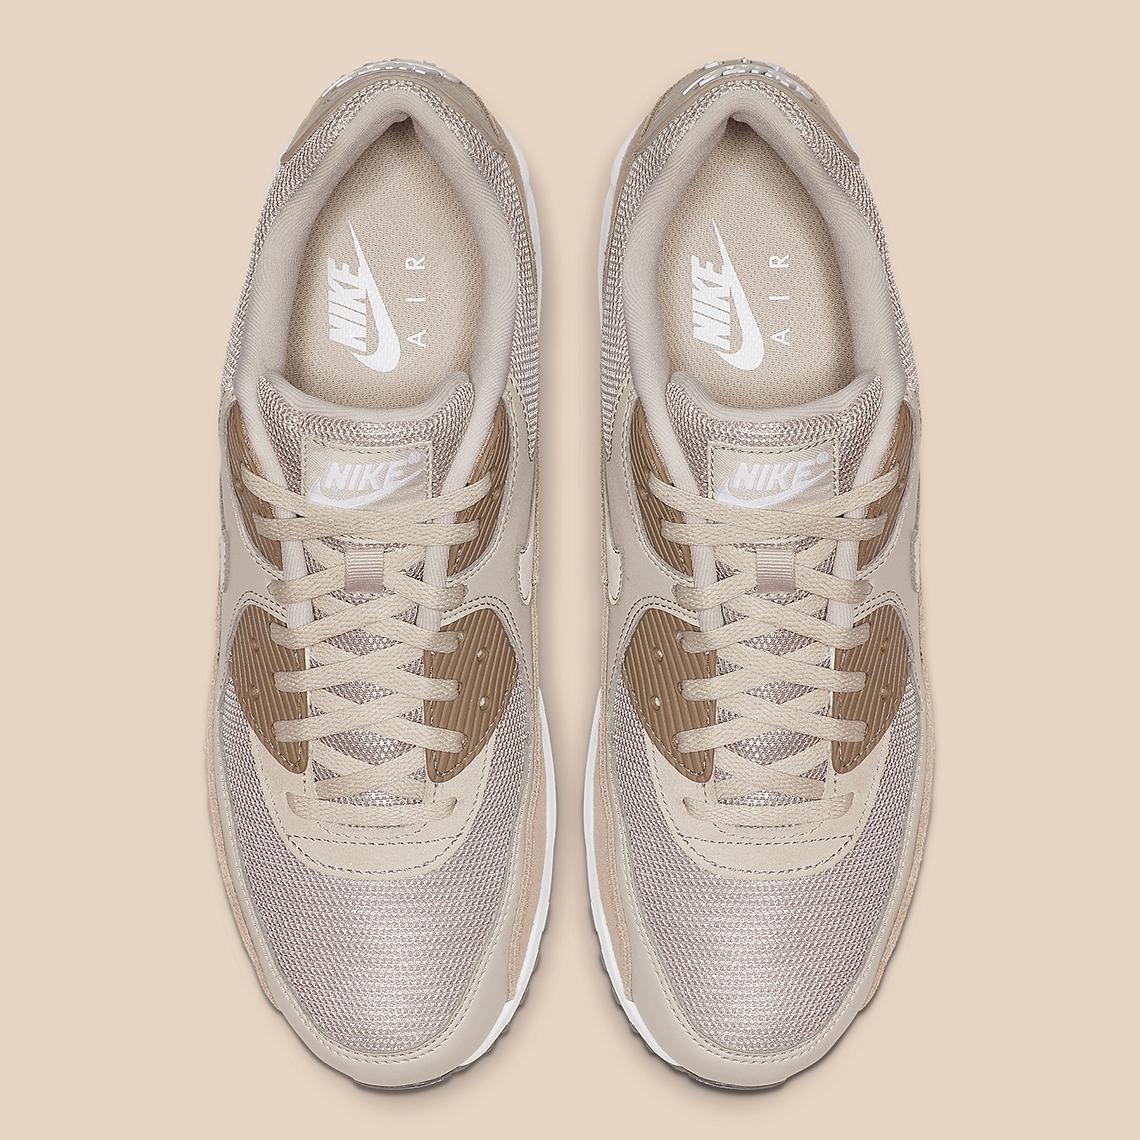 7522d54fa4 Nike Air Max 90 Sepia Stone AJ1285-204 Release Info | SneakerNews.com